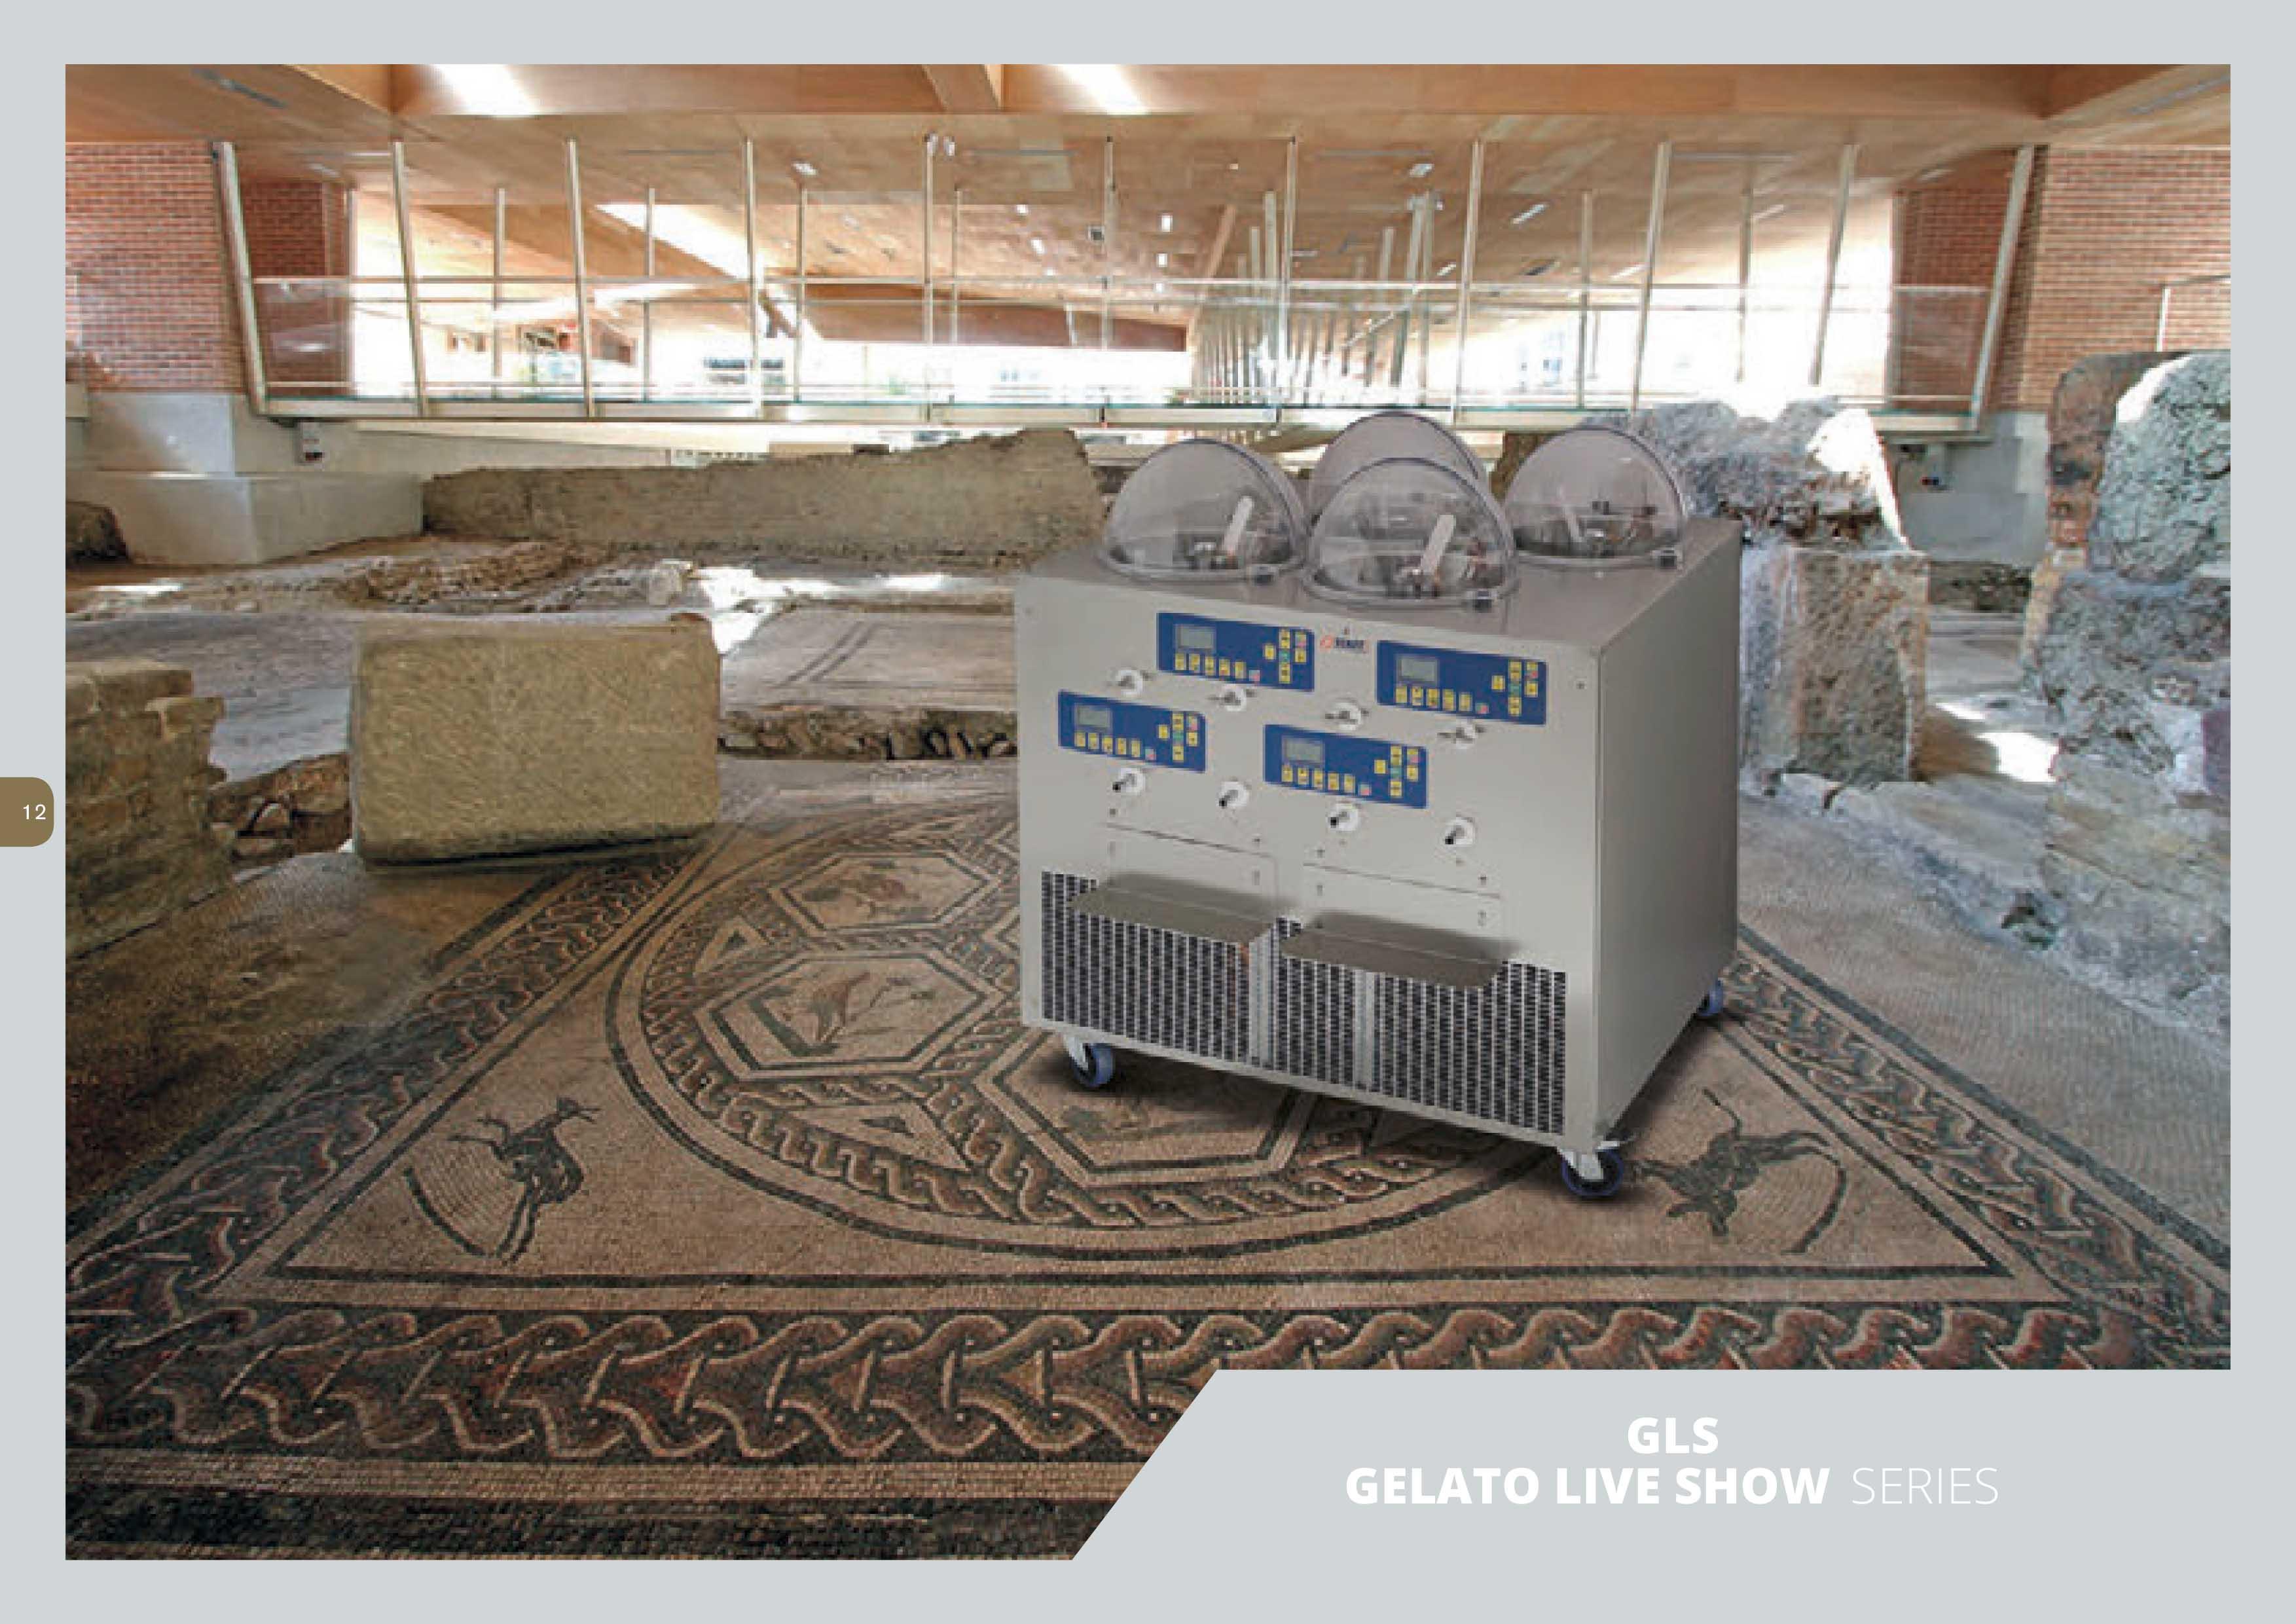 Catalogo GLS BASSA - New-14